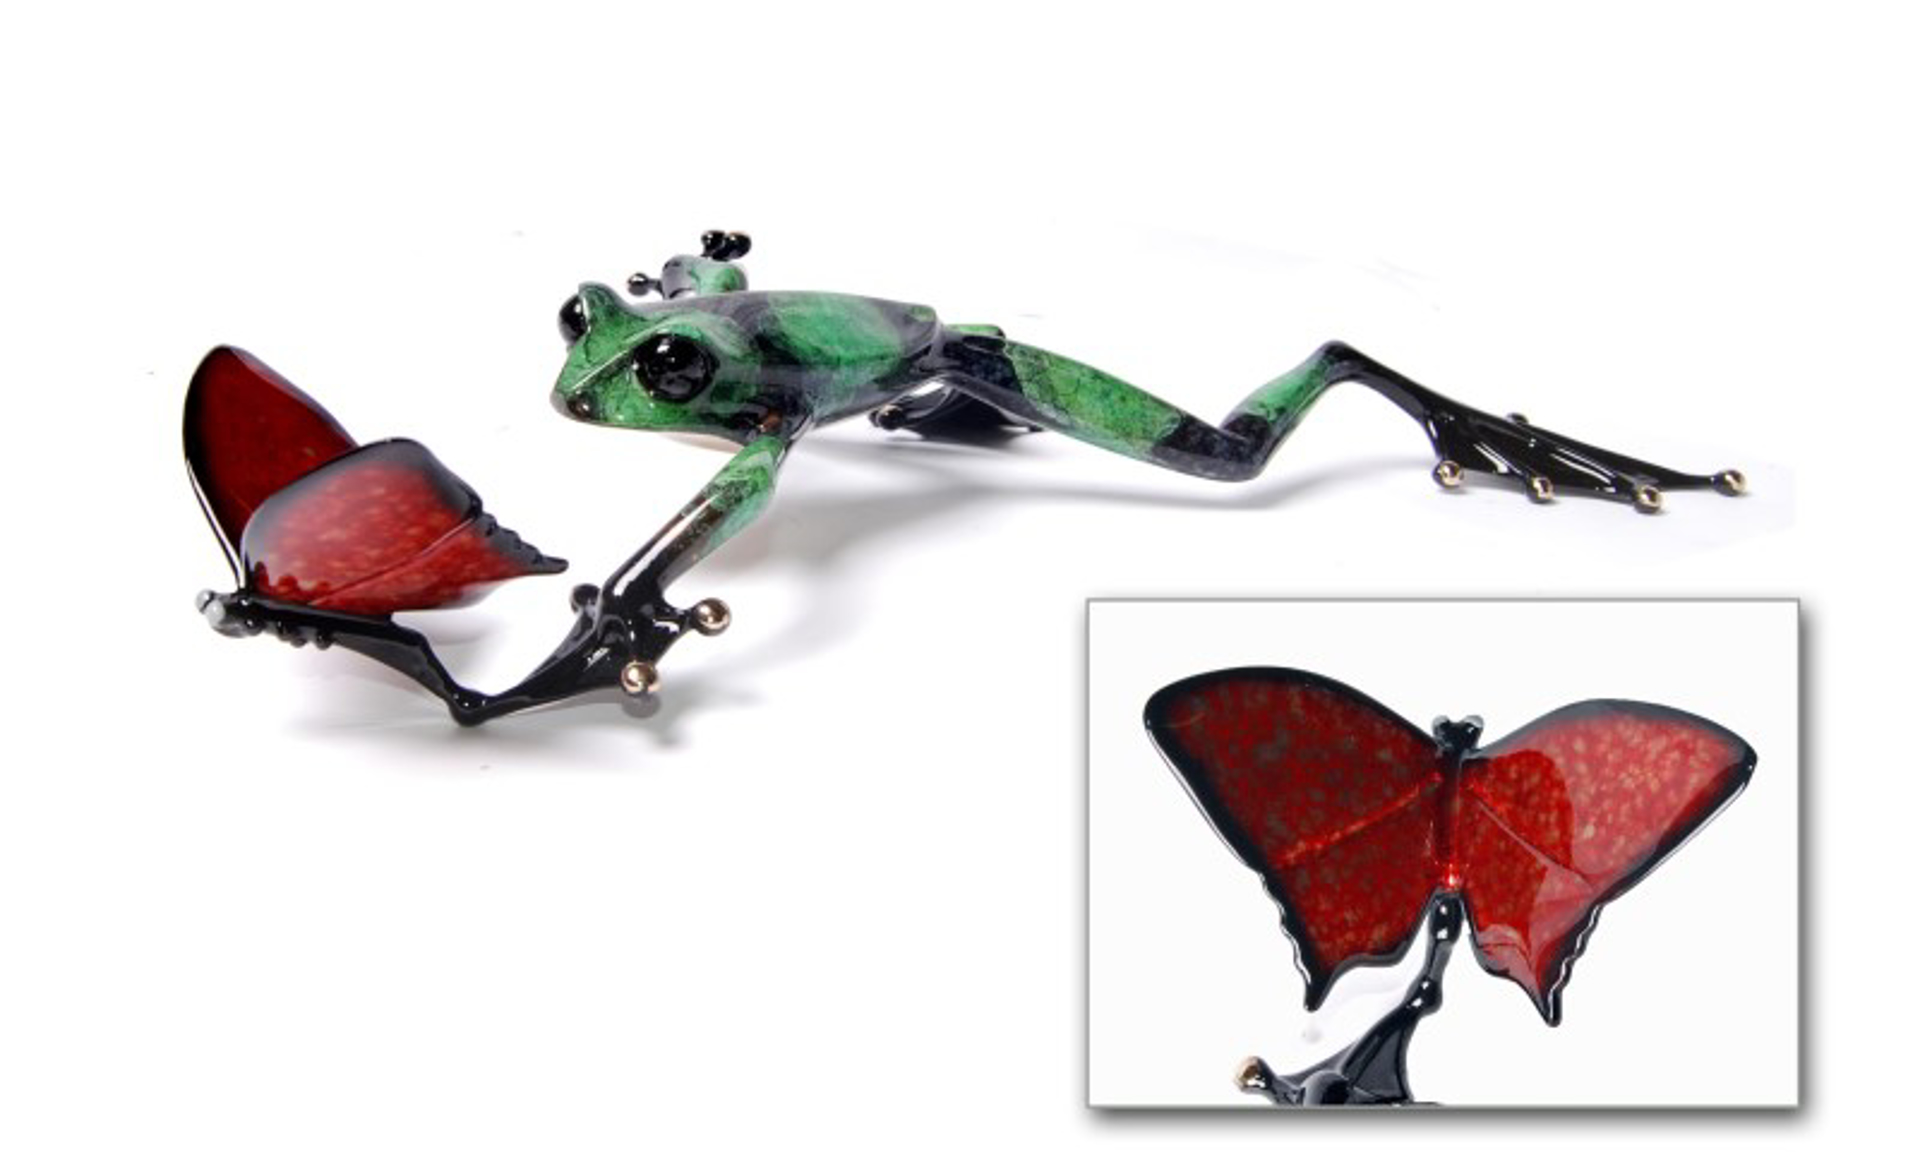 Taking Flight by The Frogman